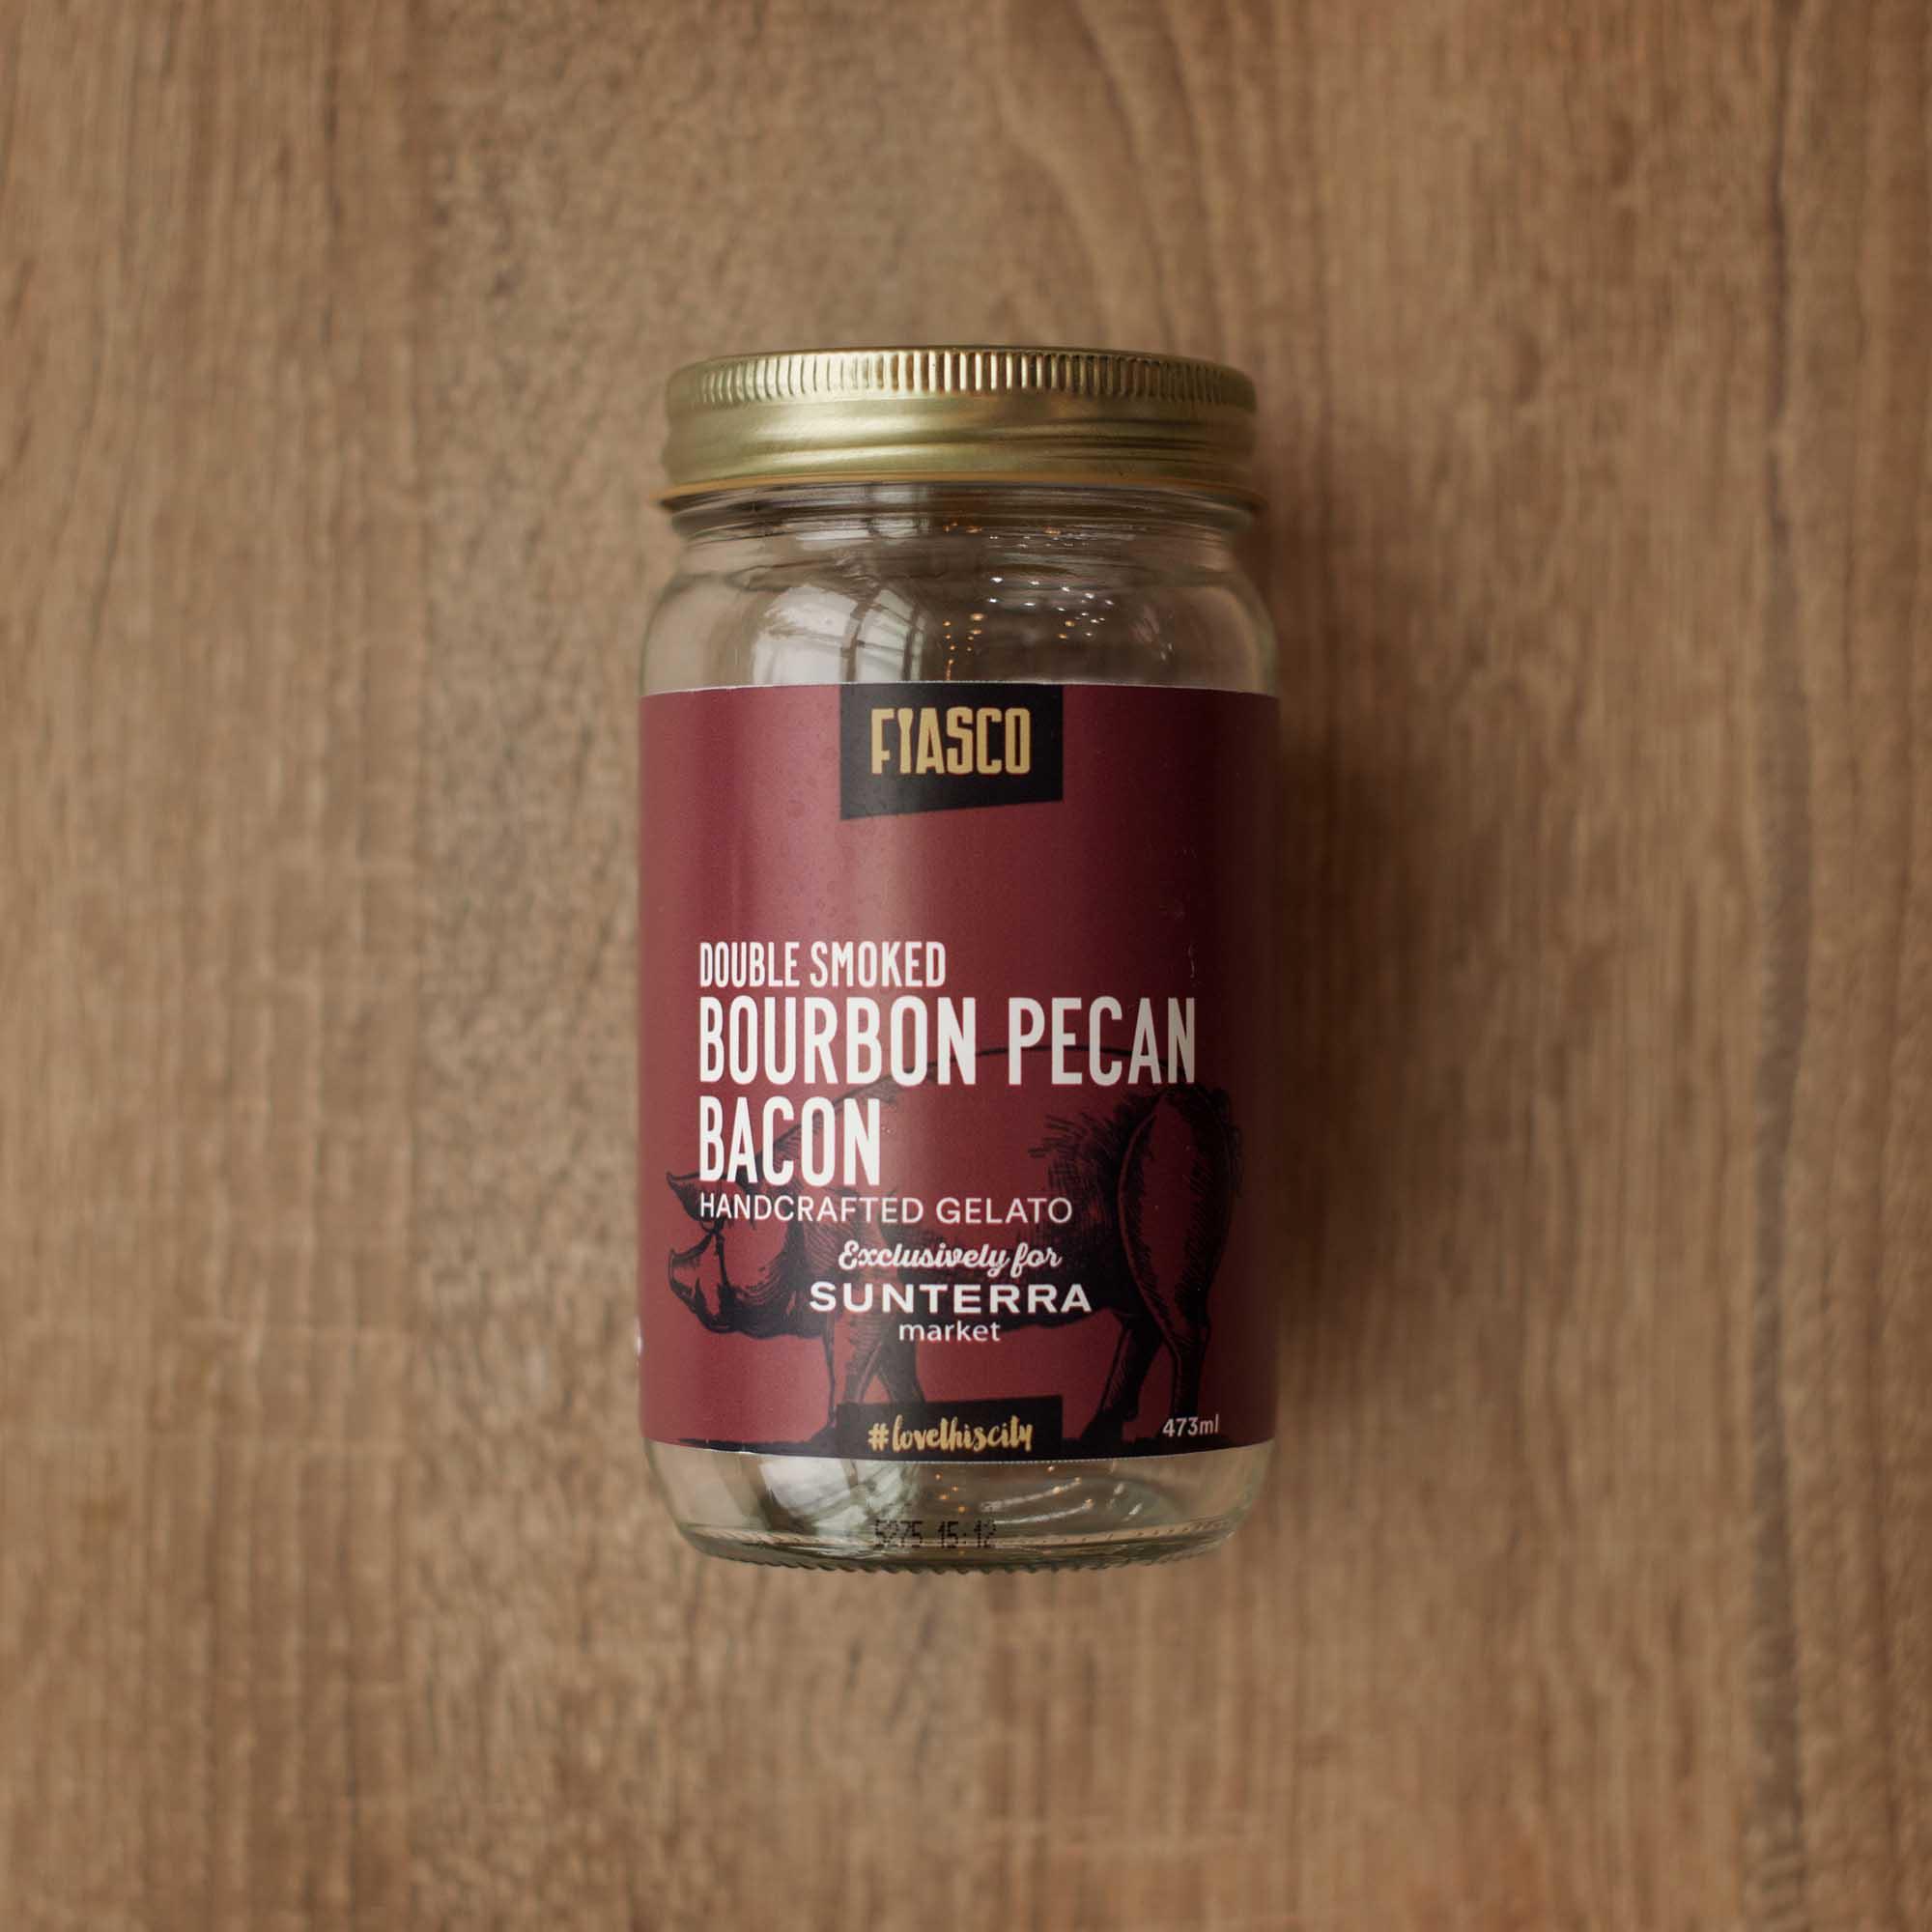 SUNTERRAMARKET - BOURBONPECAN BACON FUMÉ DOUBLEMois de porc